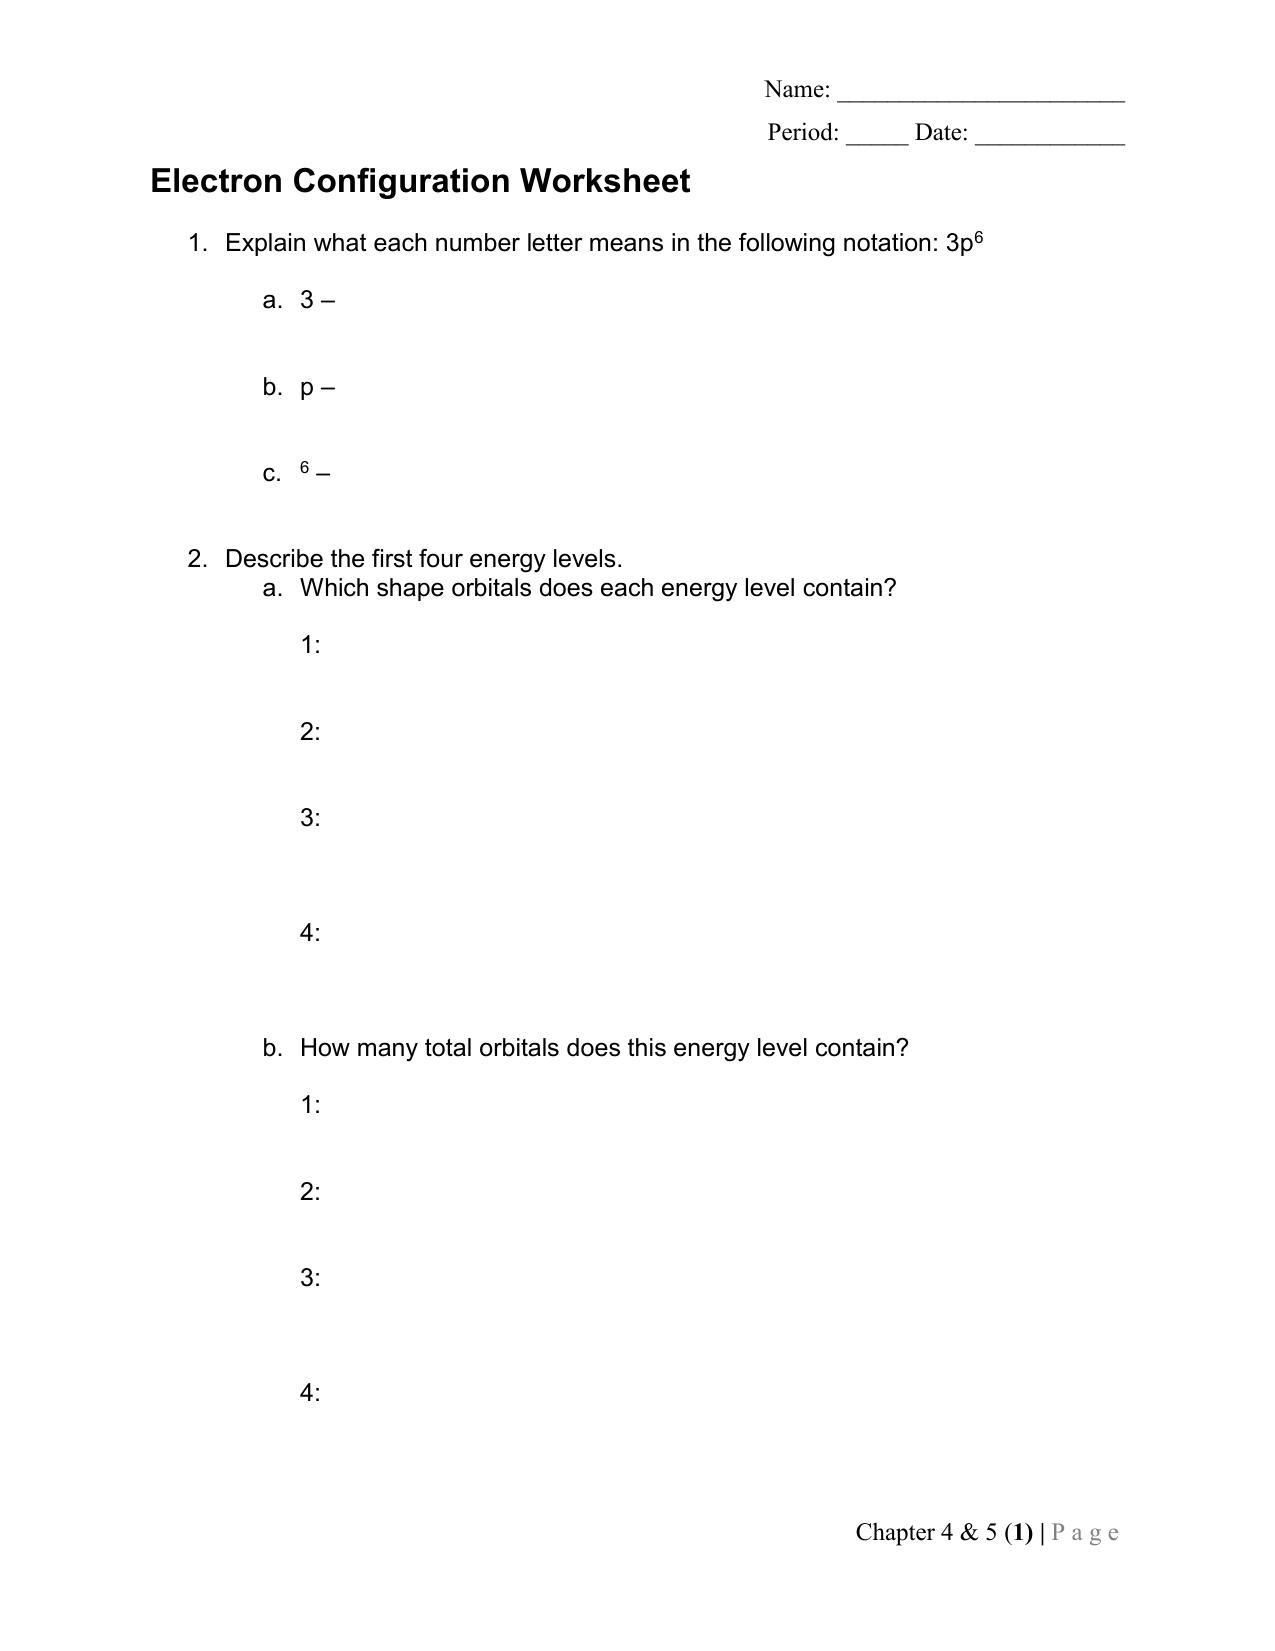 Worksheets Chapter 4 5